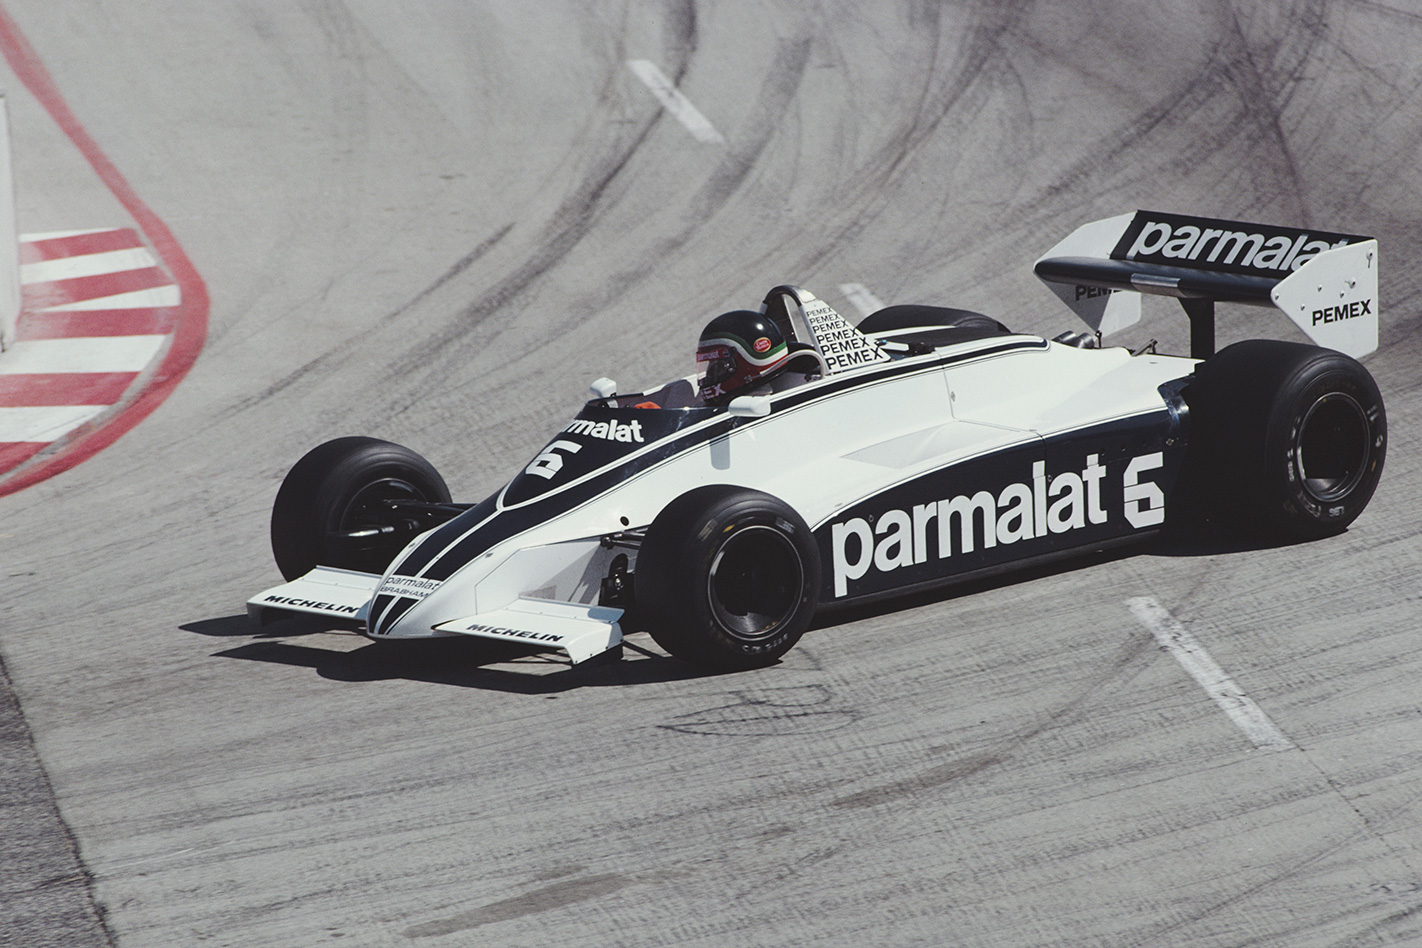 Five of Brabham's best cars